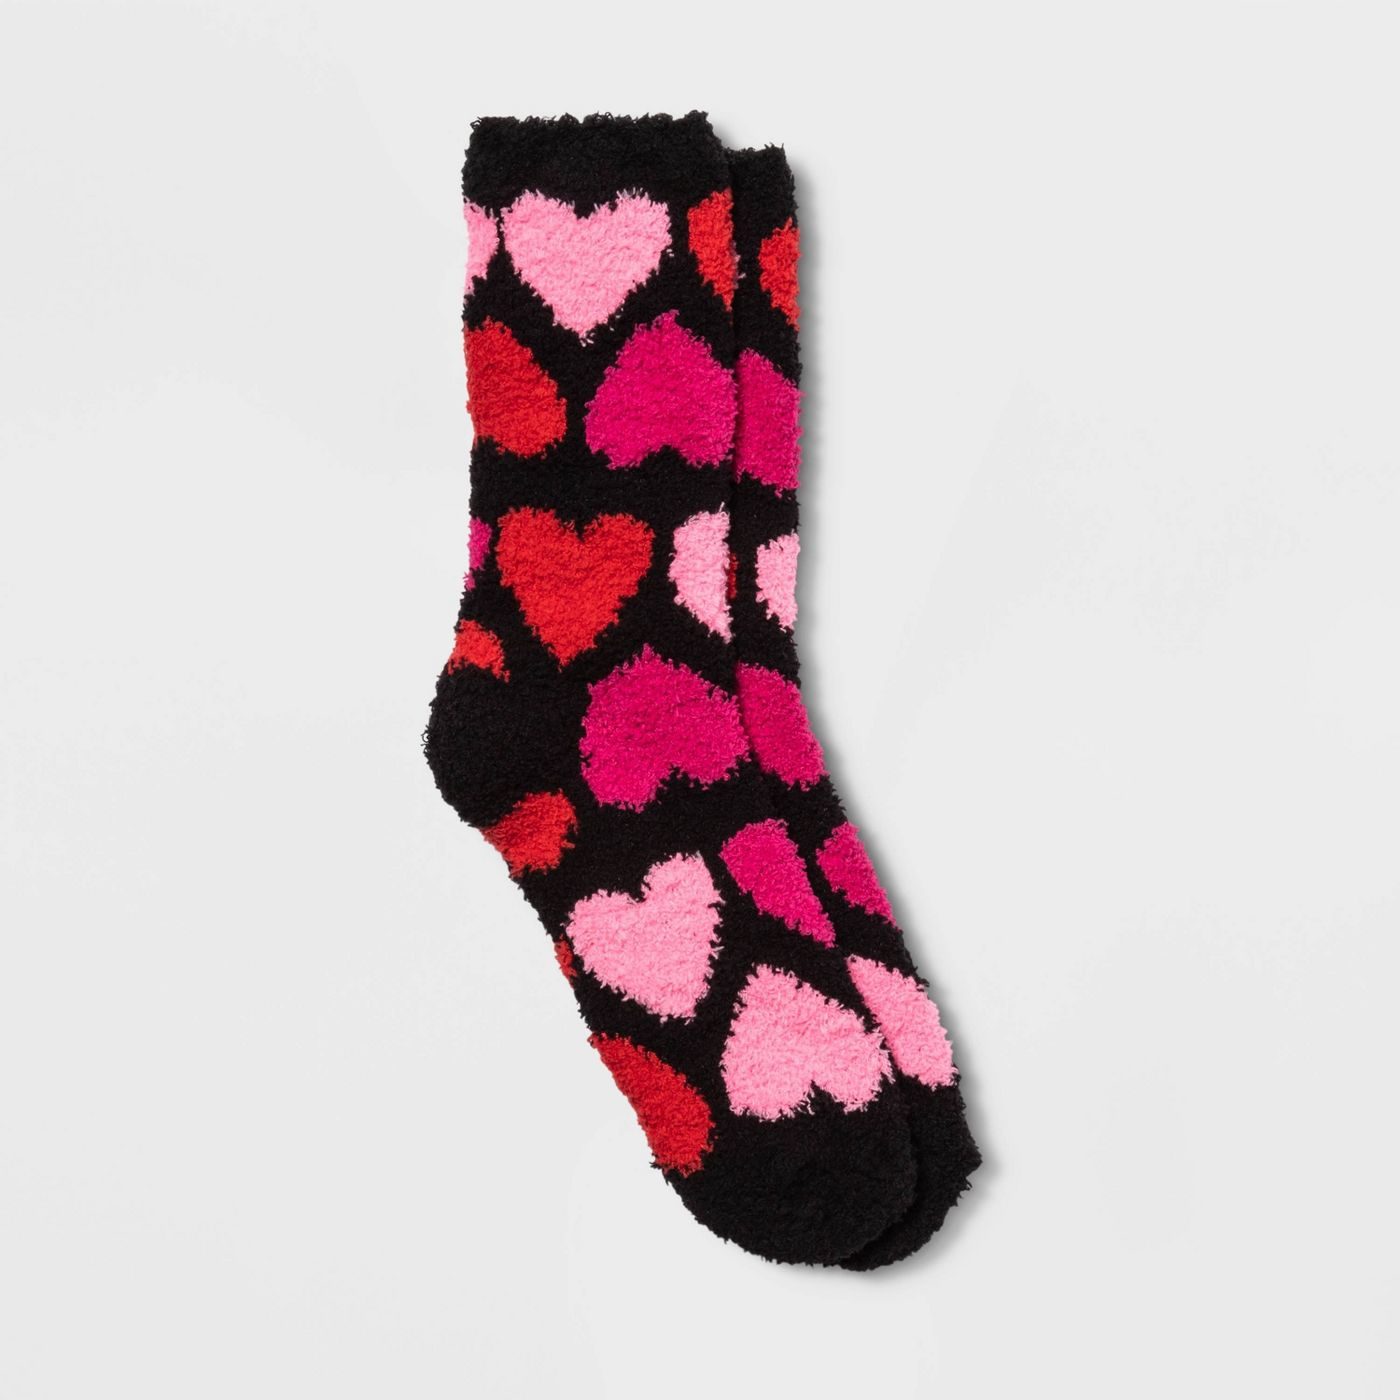 Women's Cozy Big Hearts Valentine's Day Crew Socks - Black 4-10 - image 1 of 4